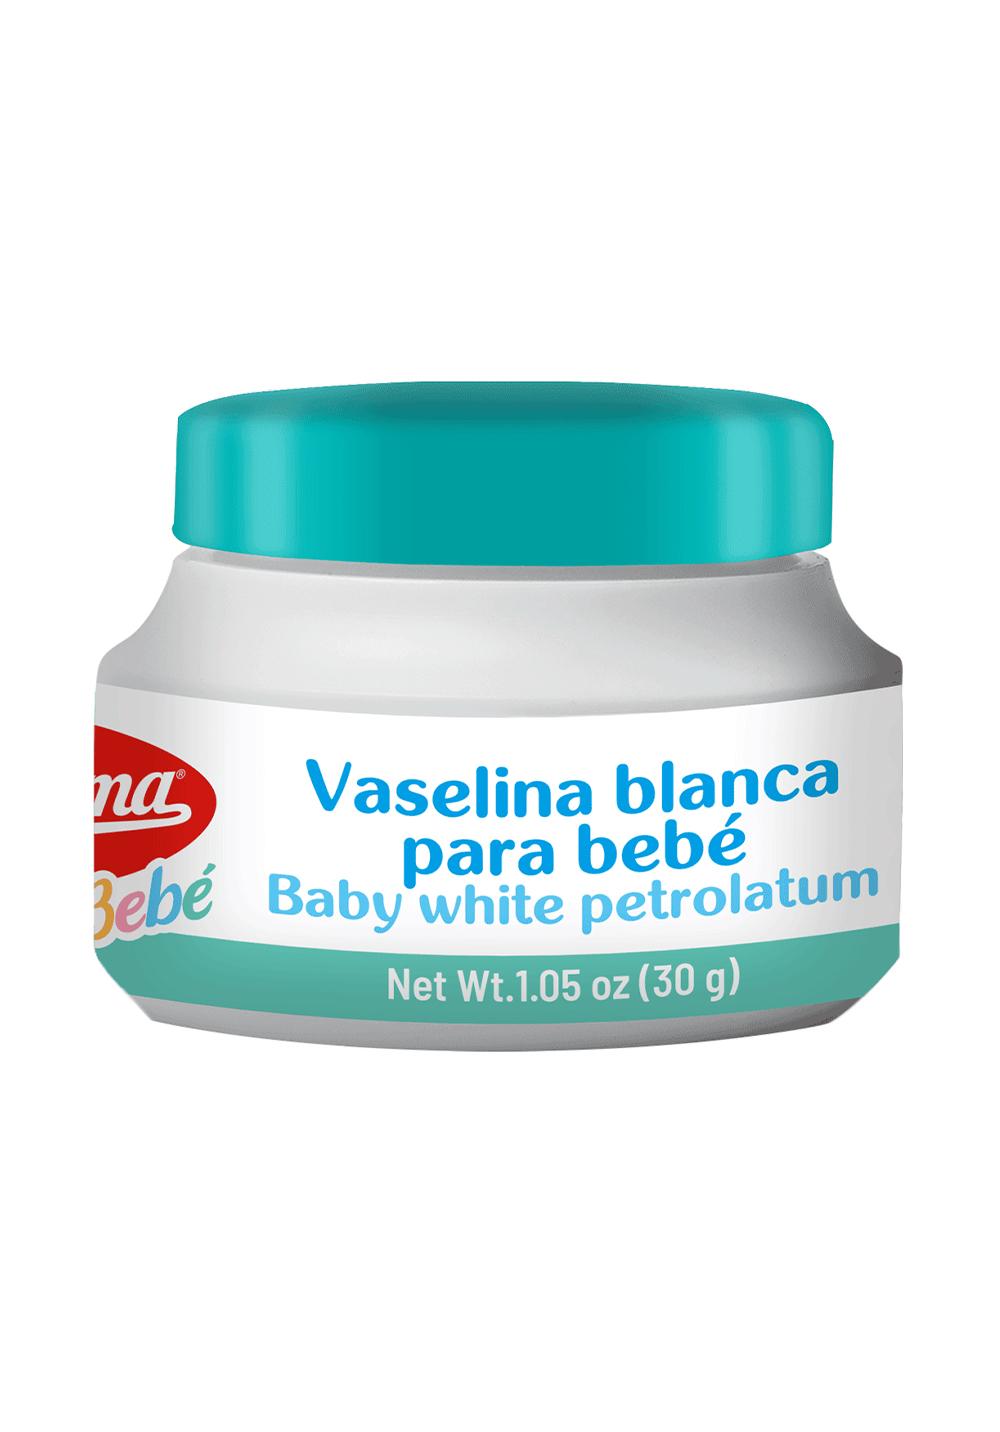 Vaselina de bebé, tarro 30 g